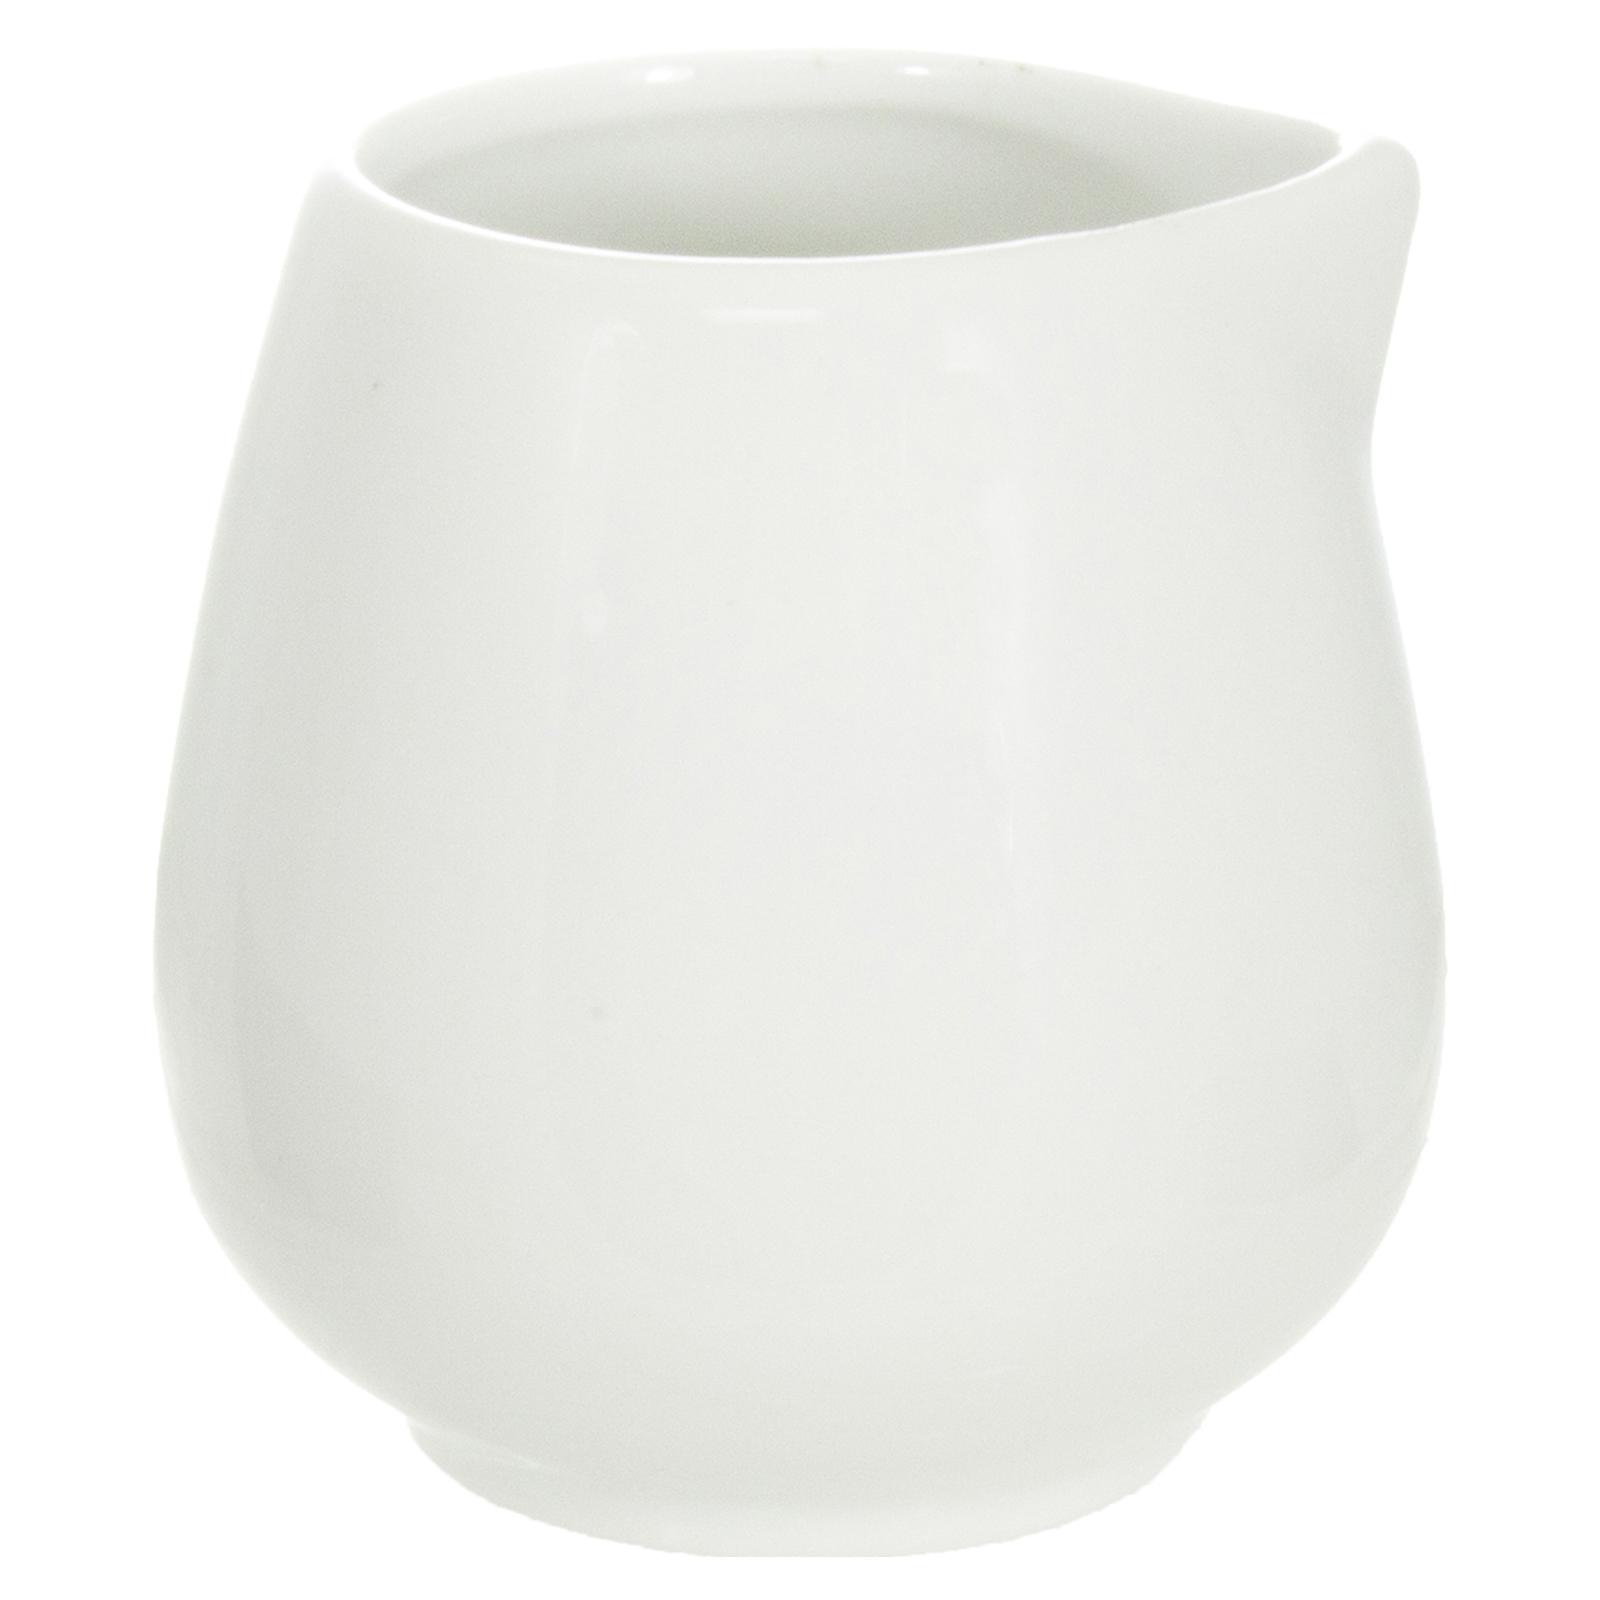 International Tableware PC-50 creamer / pitcher, china